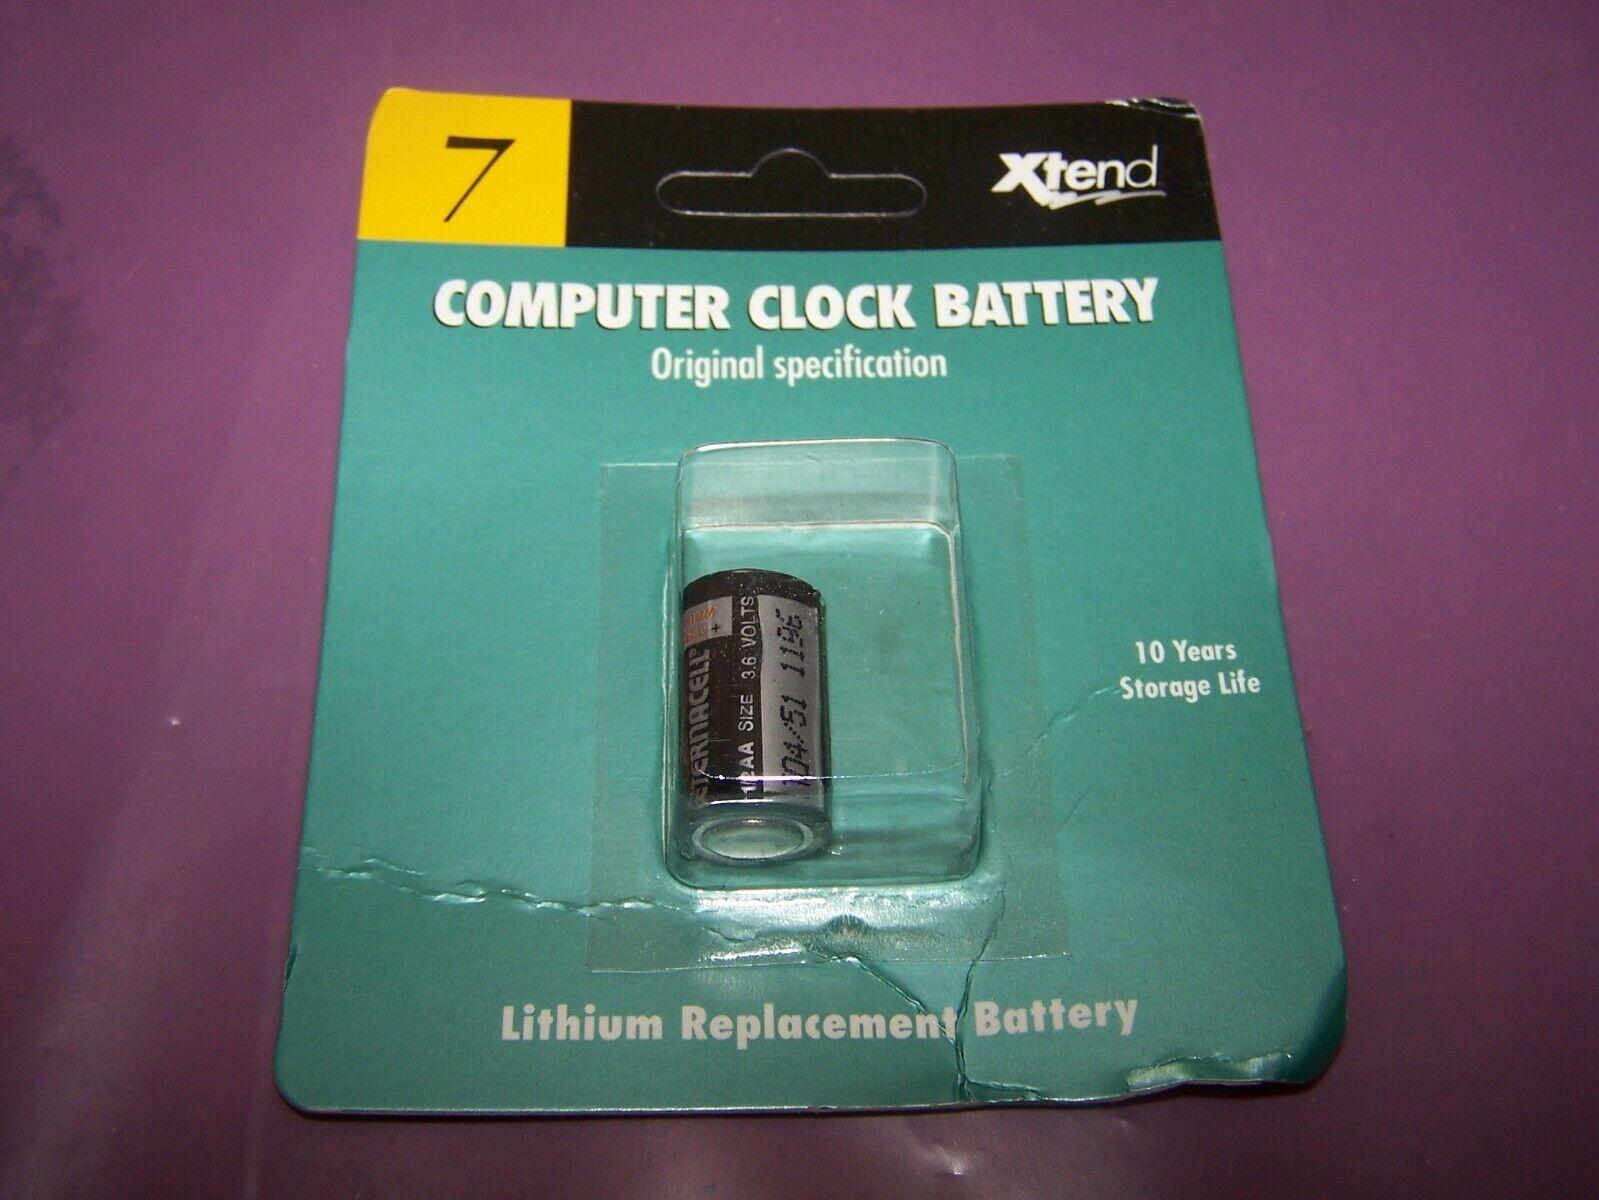 Xtend 3.6 V Lithium Vintage Macintosh Computer Clock Battery P/N 700-260102